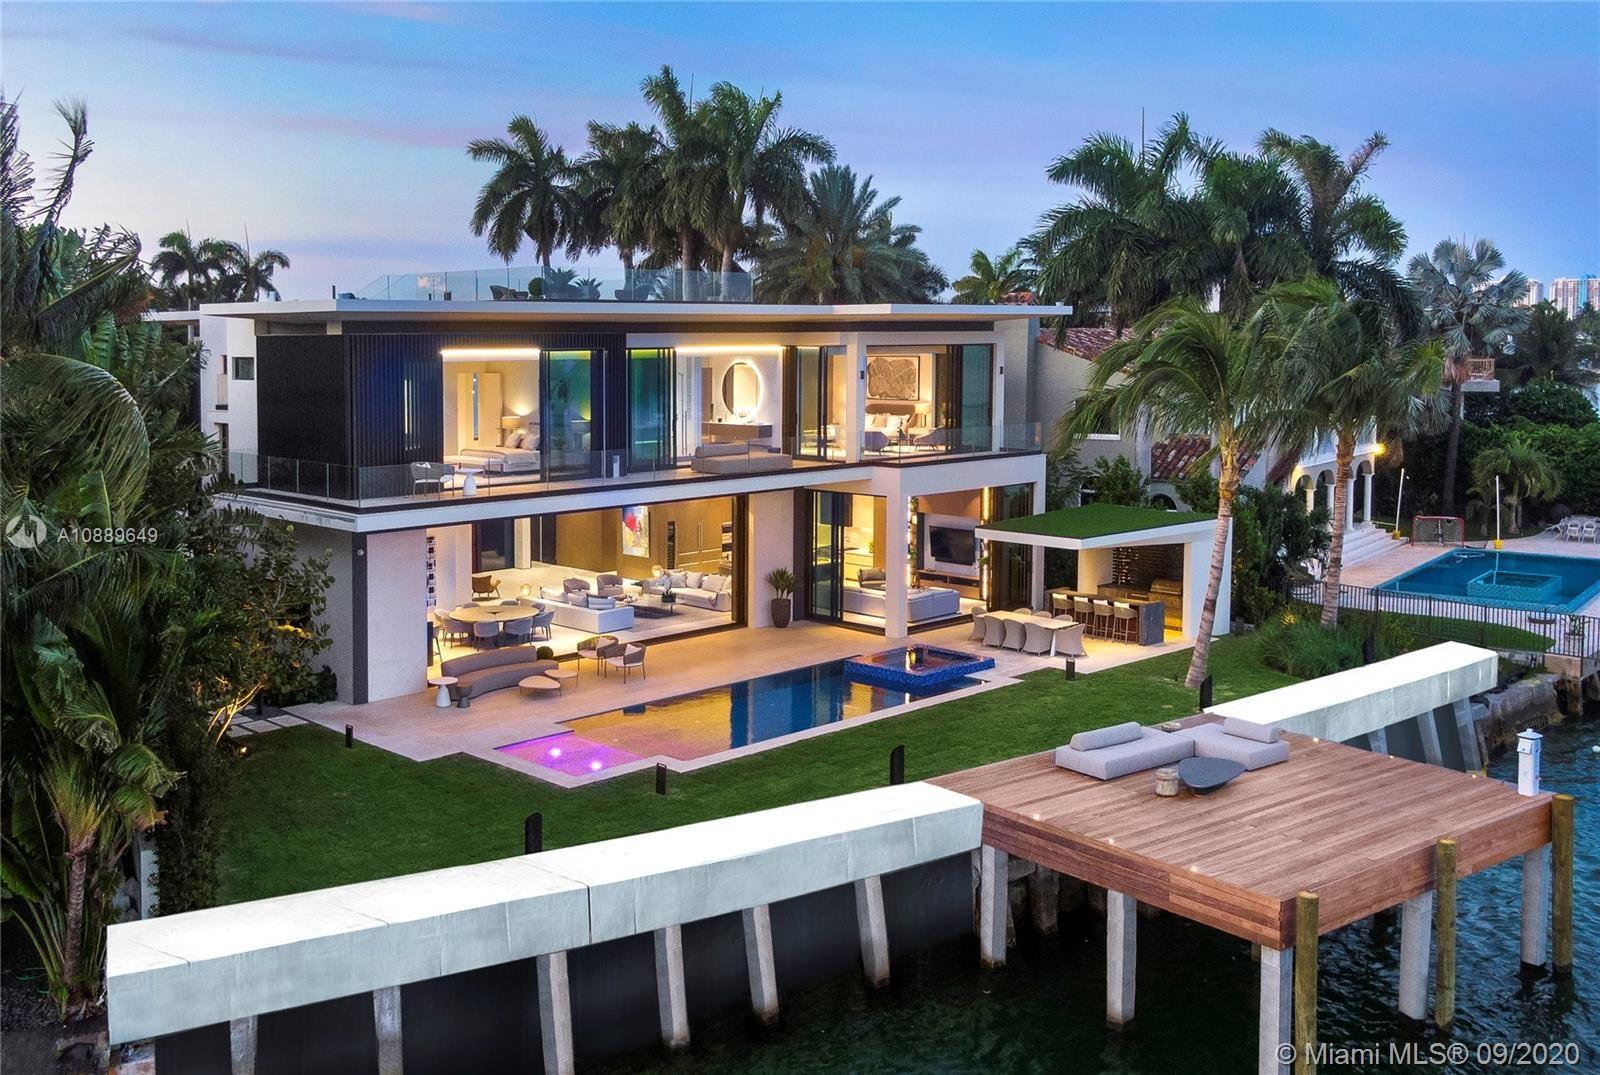 Photo 35 of Listing MLS a10889649 in 10 W San Marino Dr Miami Beach FL 33139